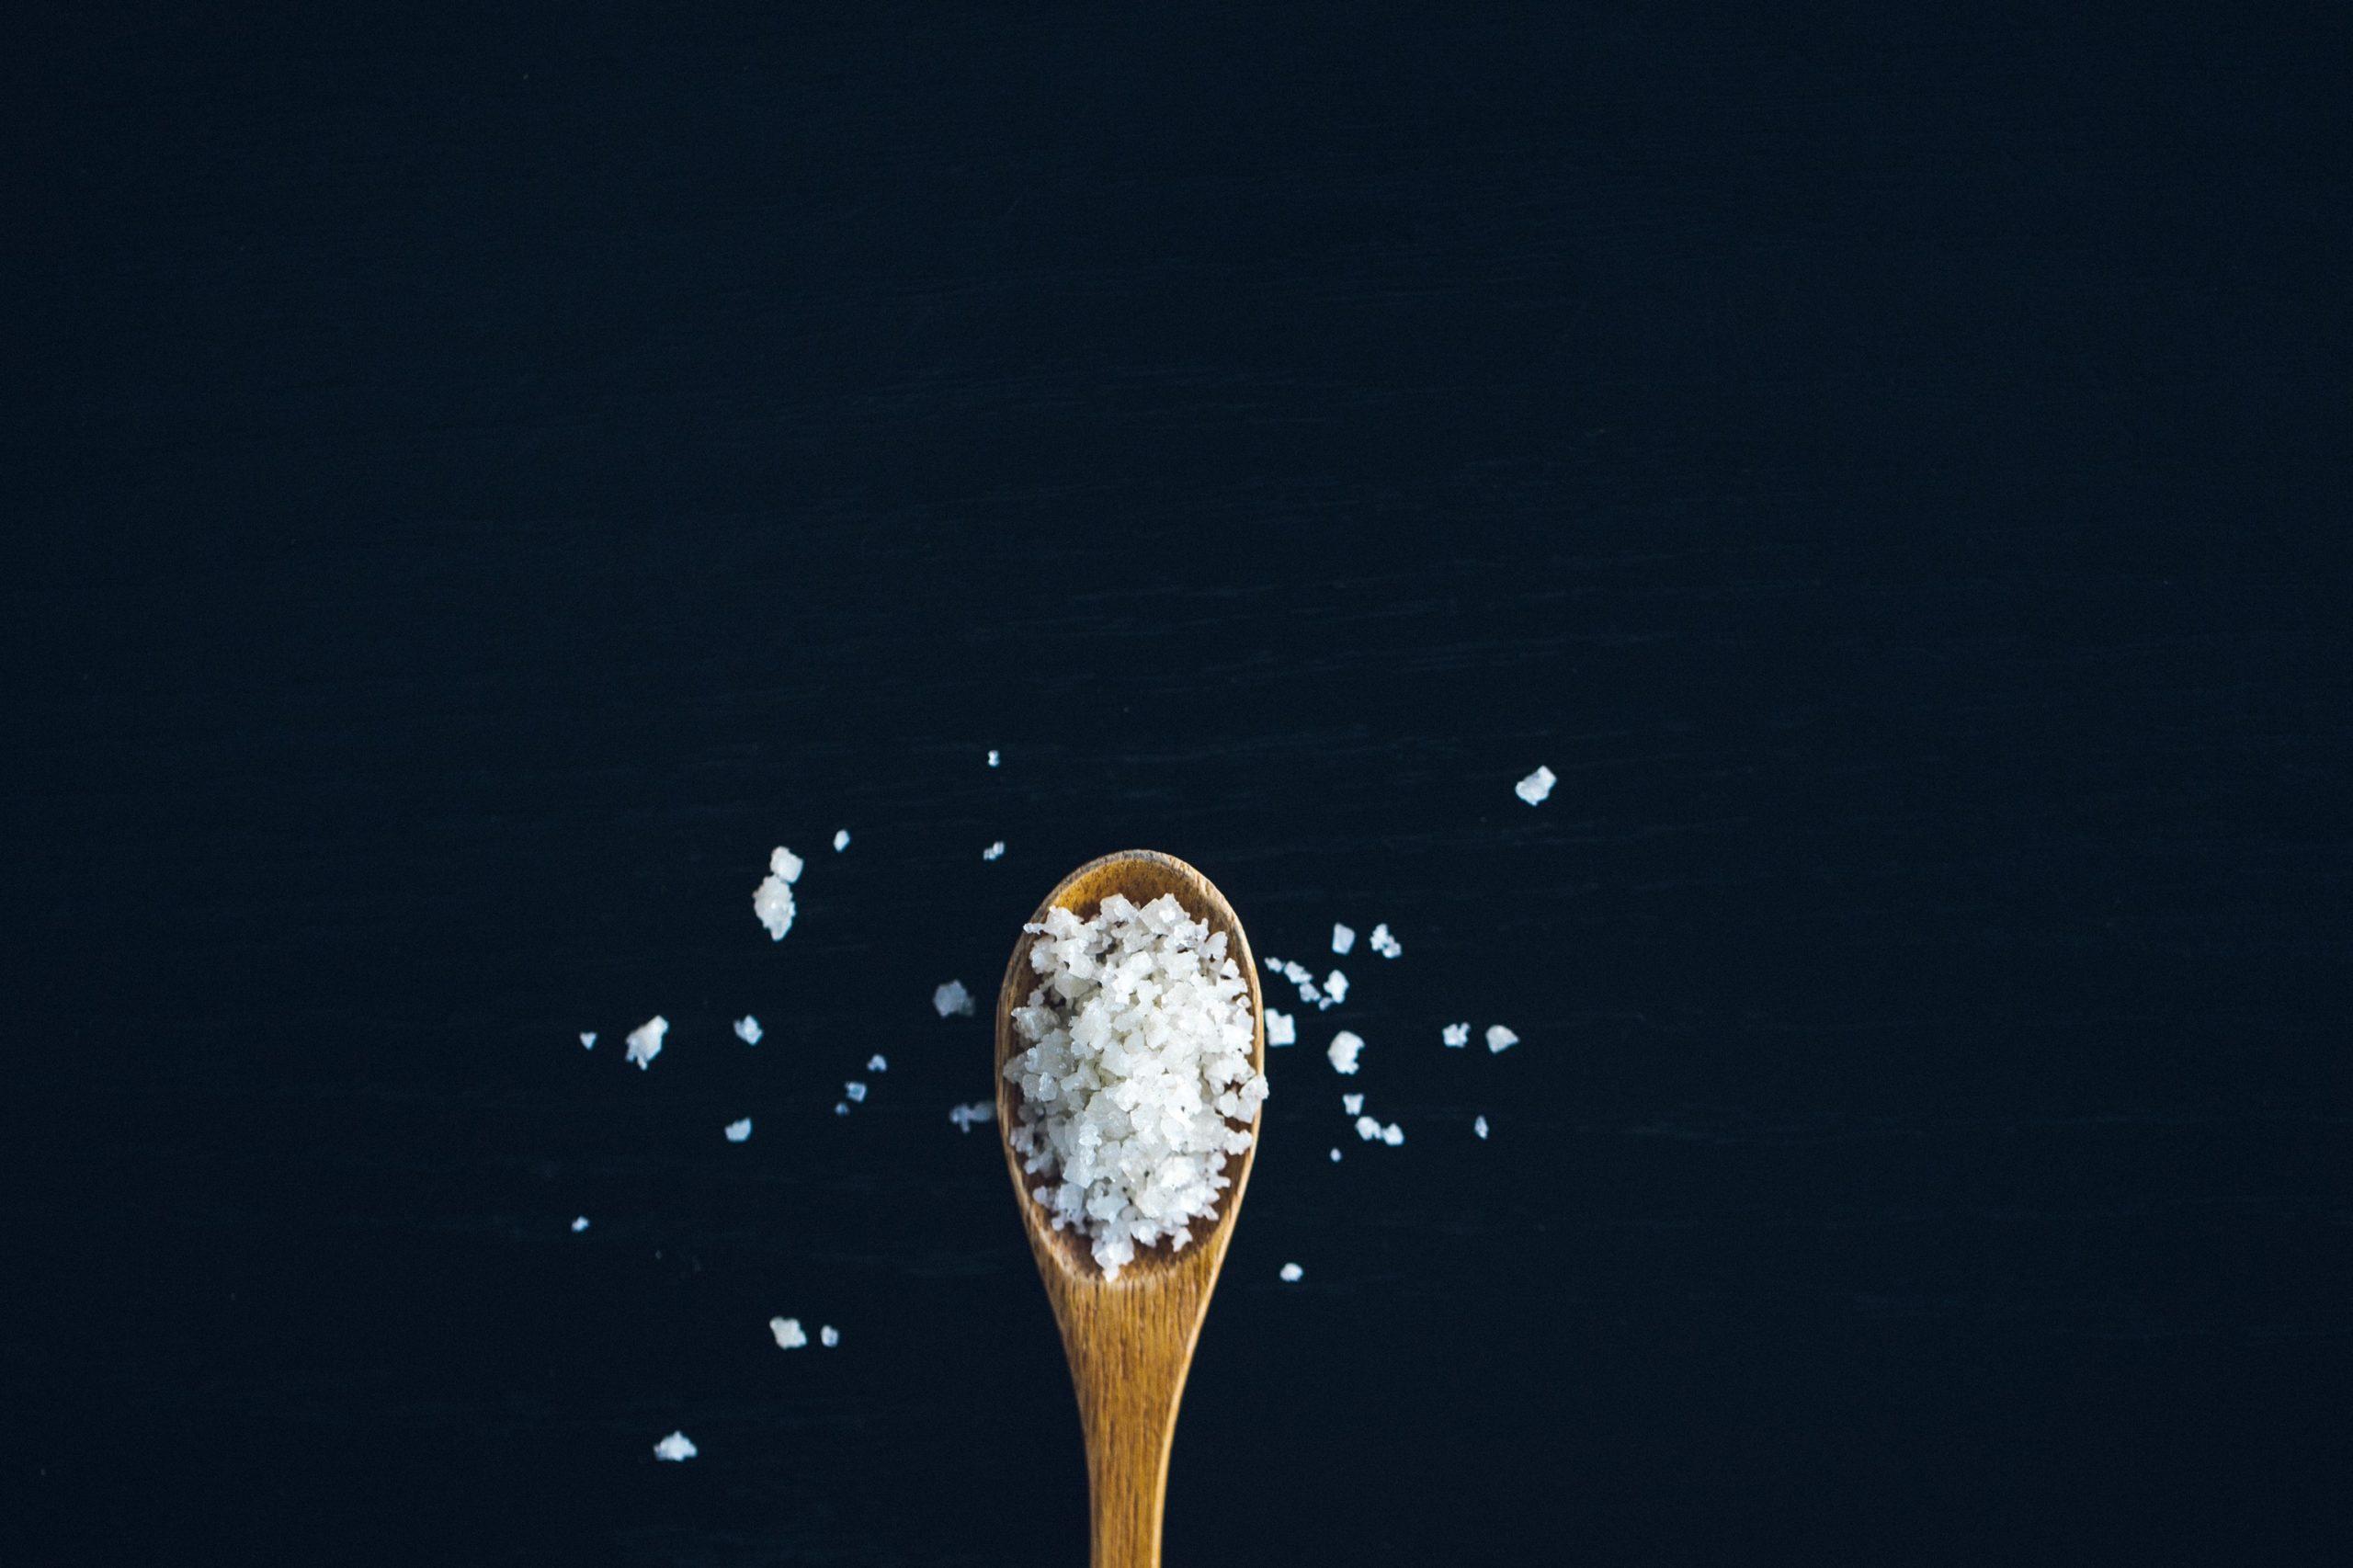 sea salt upon a wooden spatula.